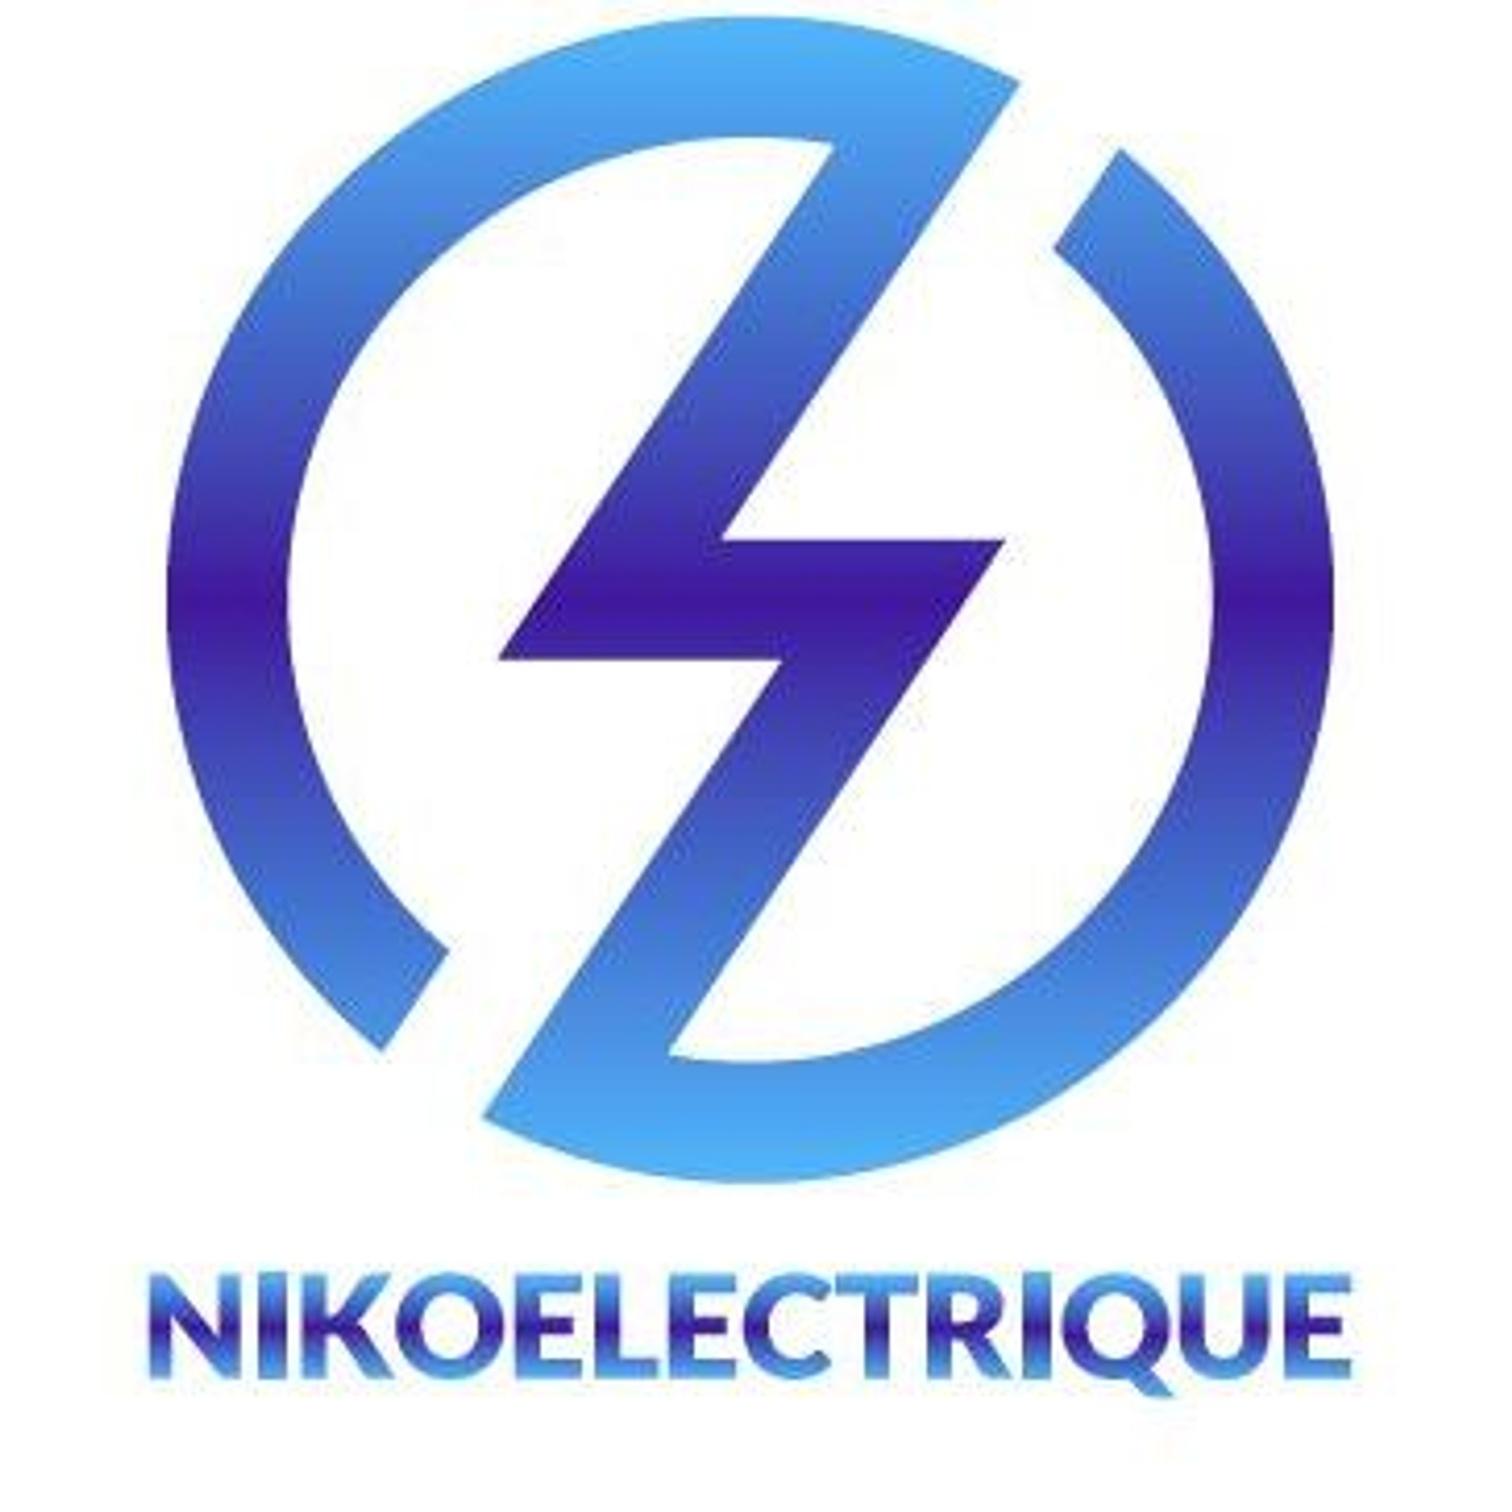 logo Nicola Leonzio Elektricien